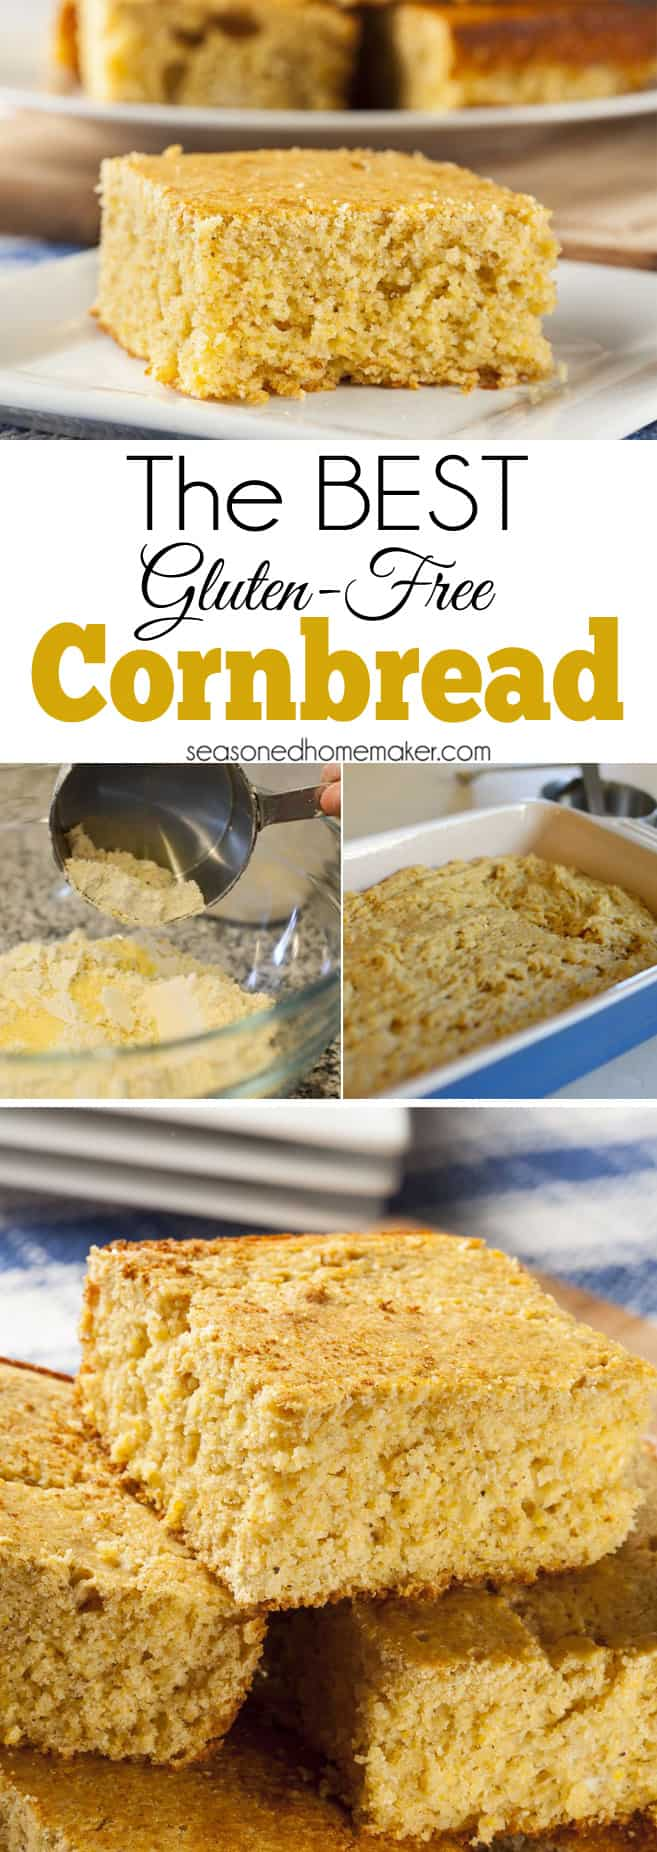 The BEST Gluten-Free Cornbread Recipe